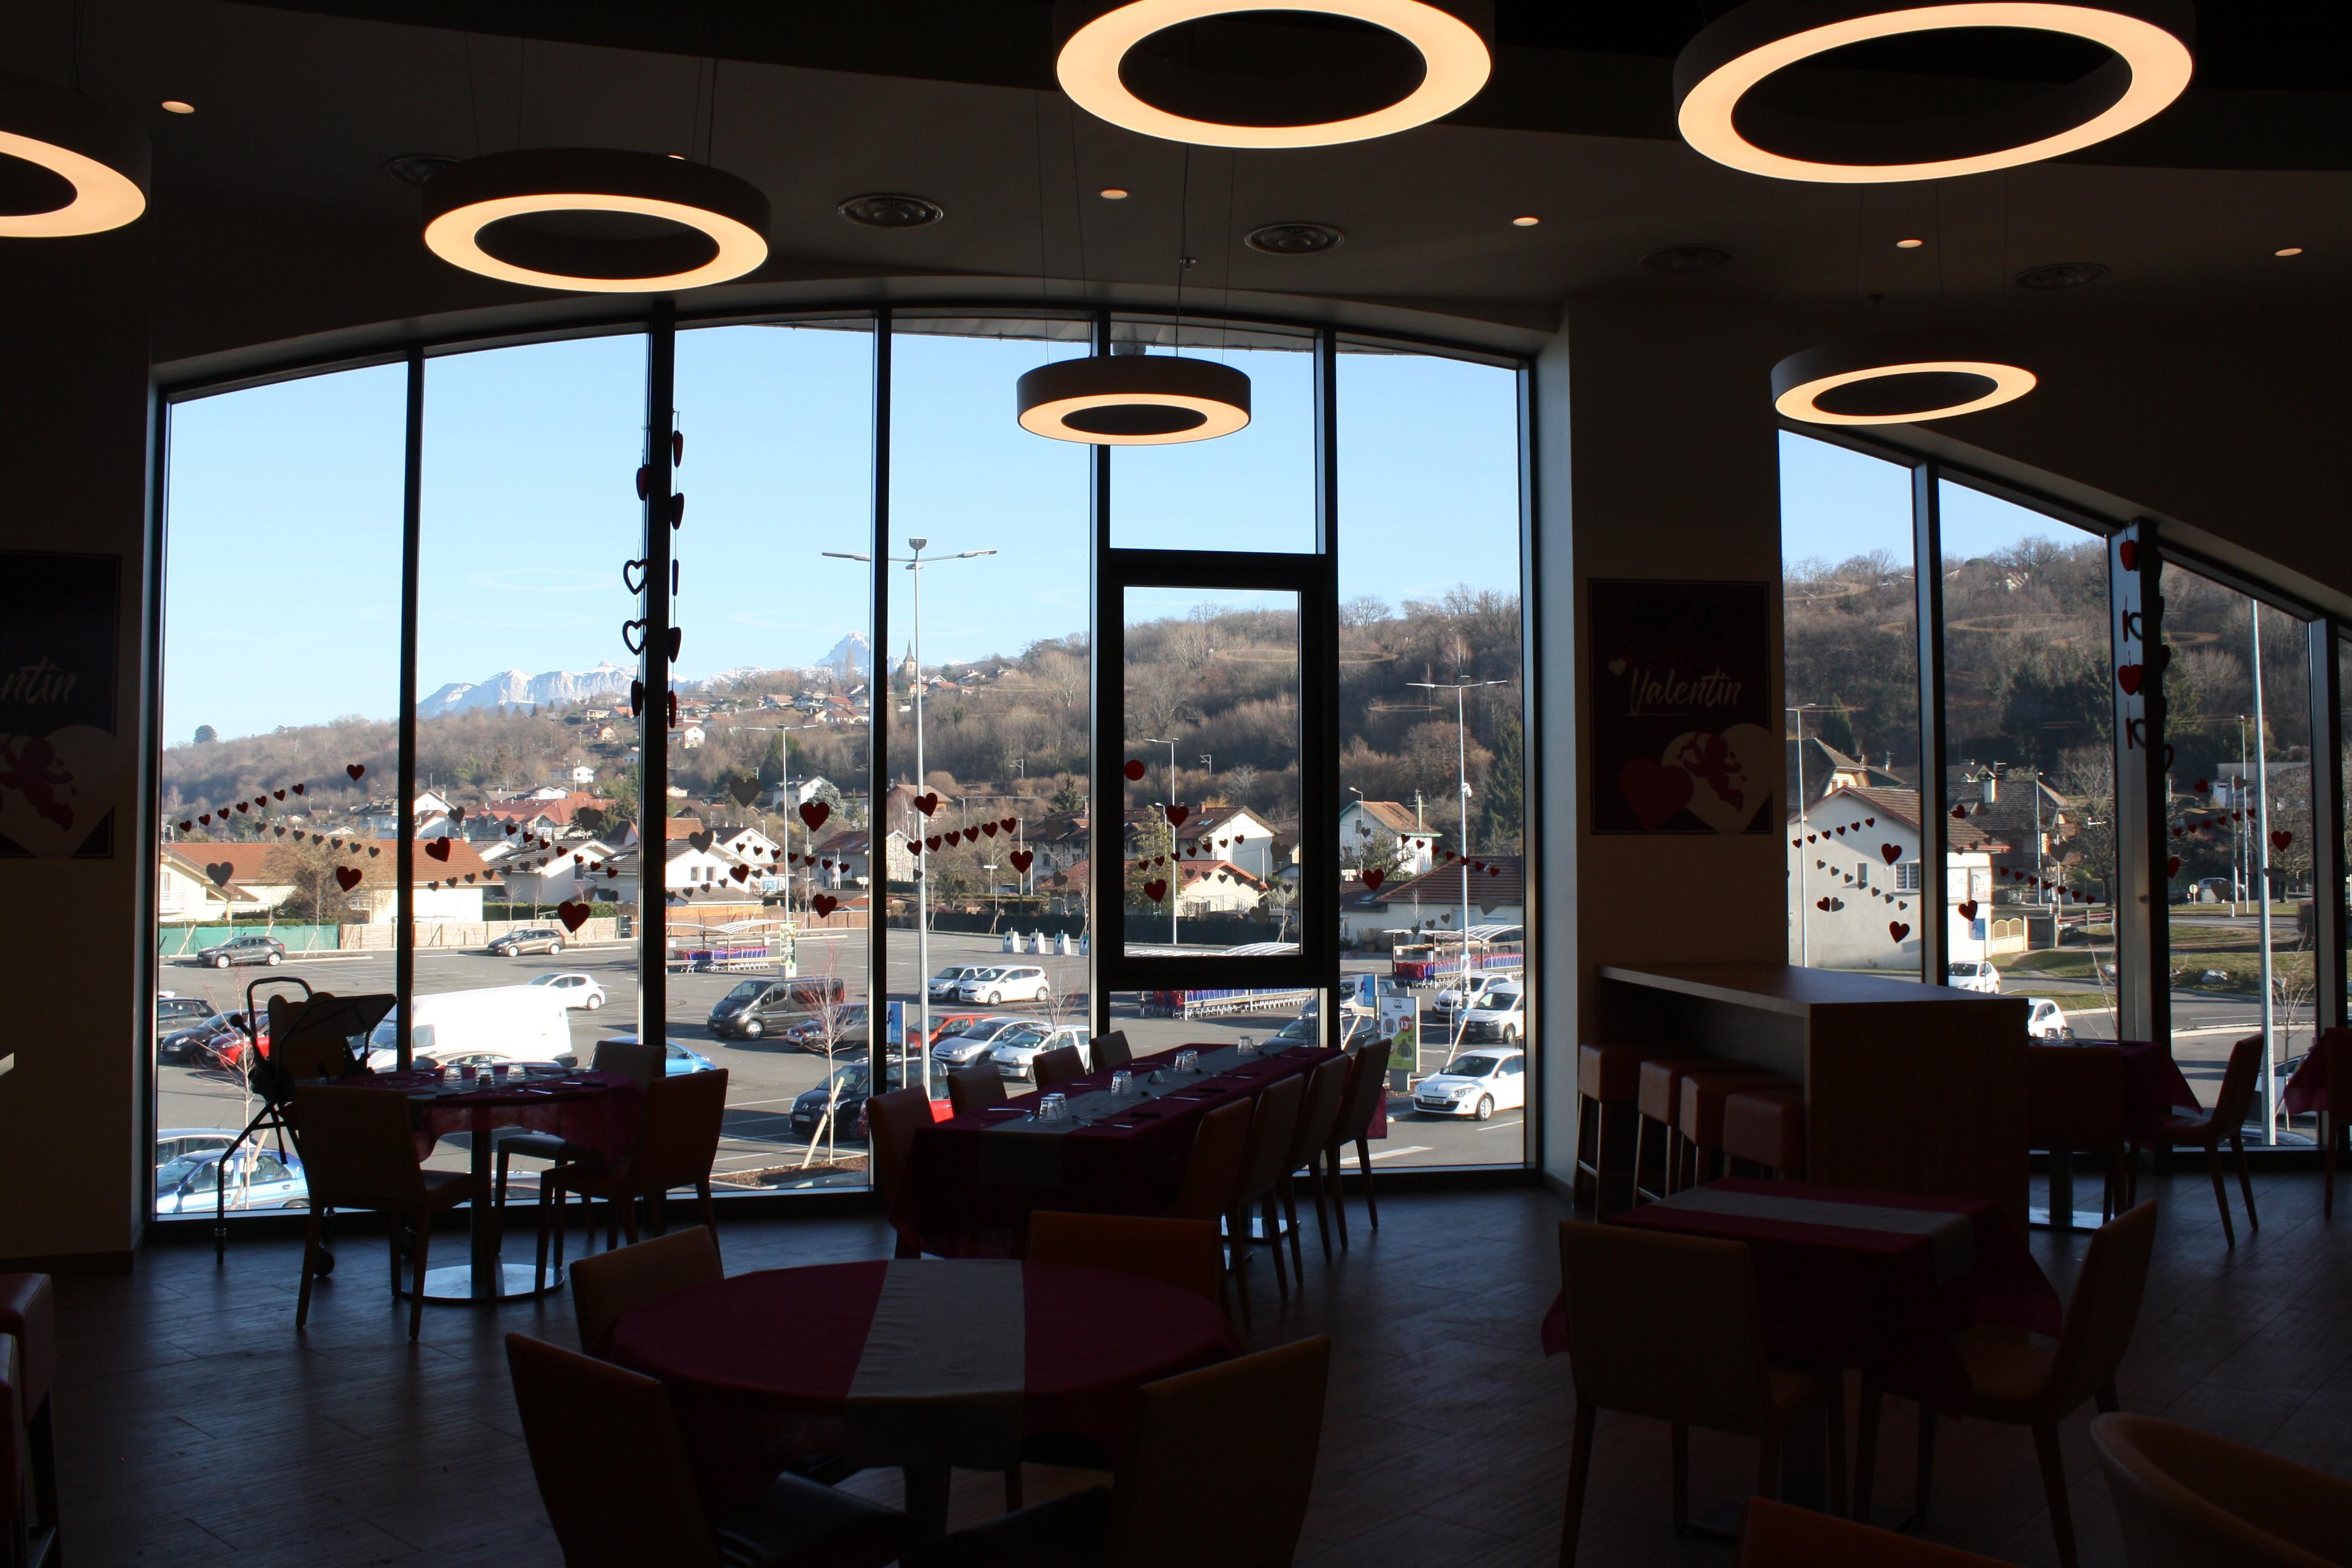 La Table Cora Cafeteria Publier